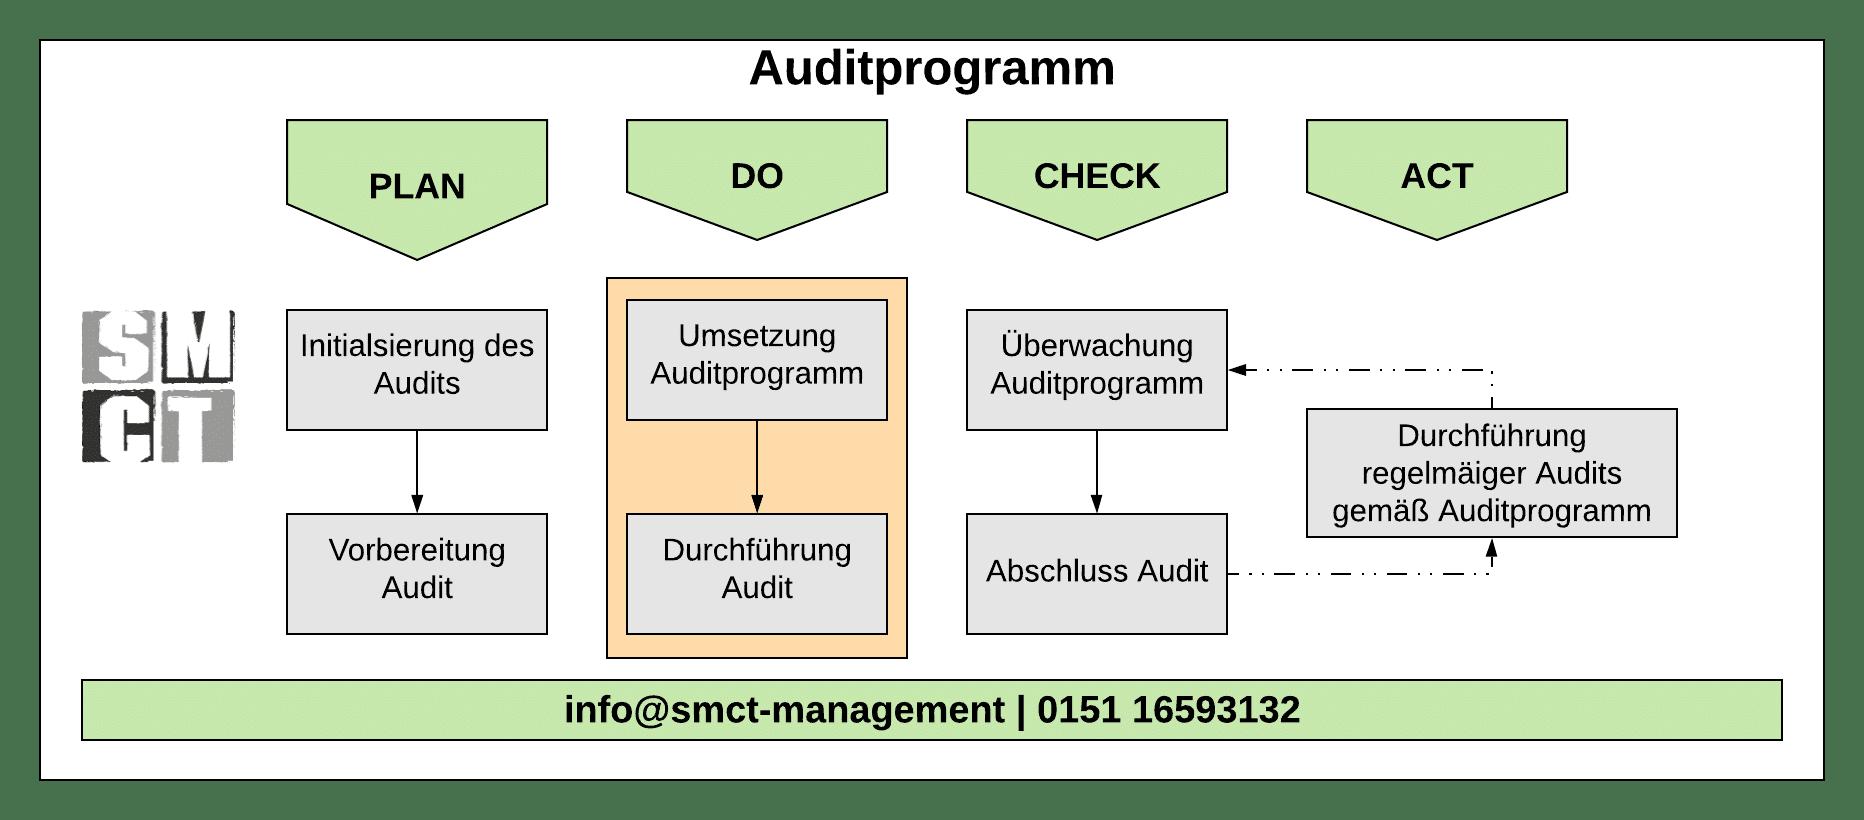 Auditprogramm Auditprozess | Smct-Management